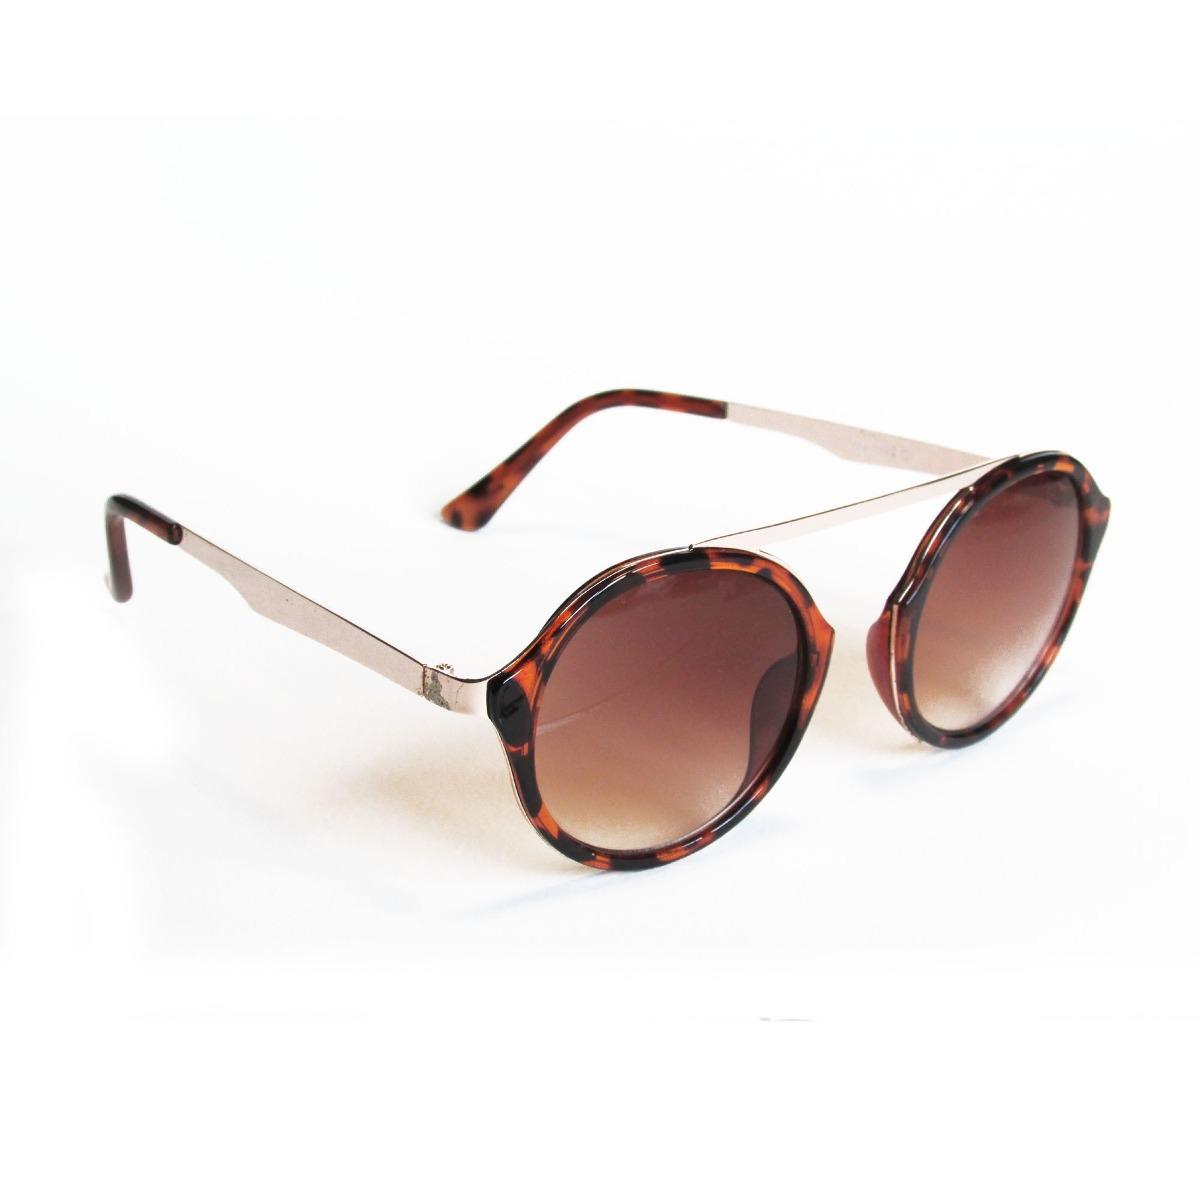 lentes gafas sol optica moda uv400 importado puente metal. Cargando zoom. 62e9424ca440